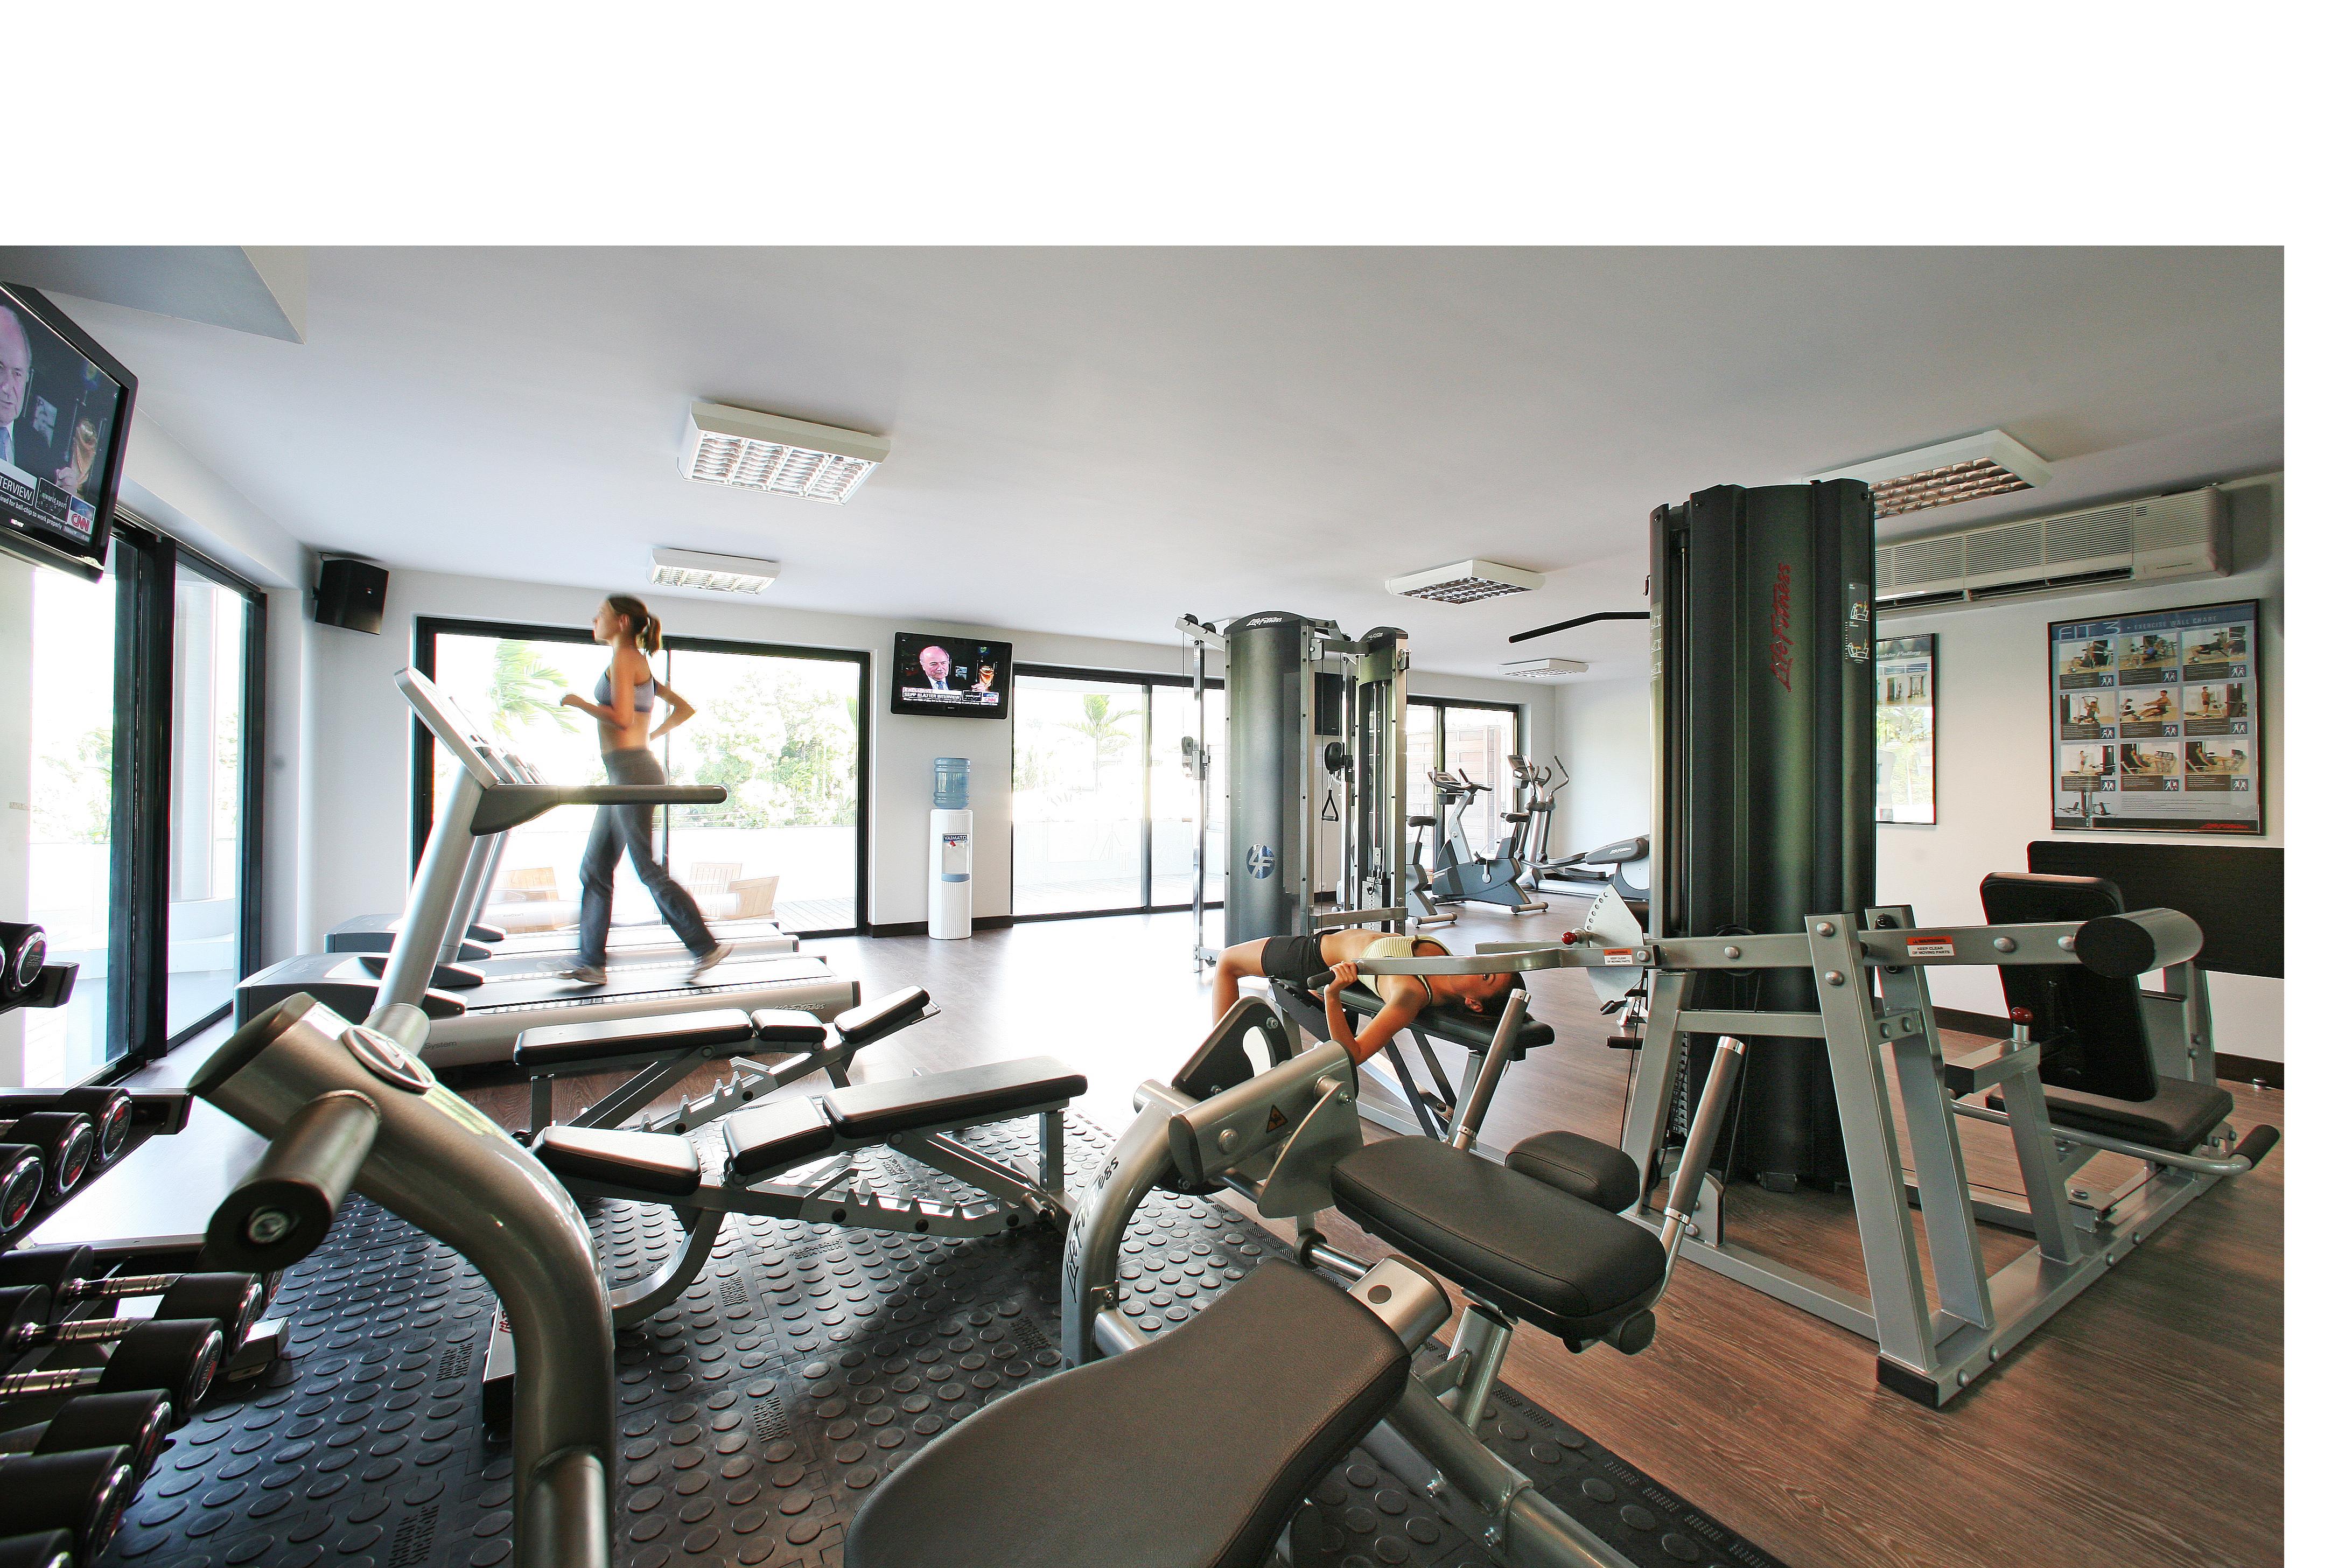 https://tahititourisme.mx/wp-content/uploads/2017/08/Fitness-centre-2.jpg